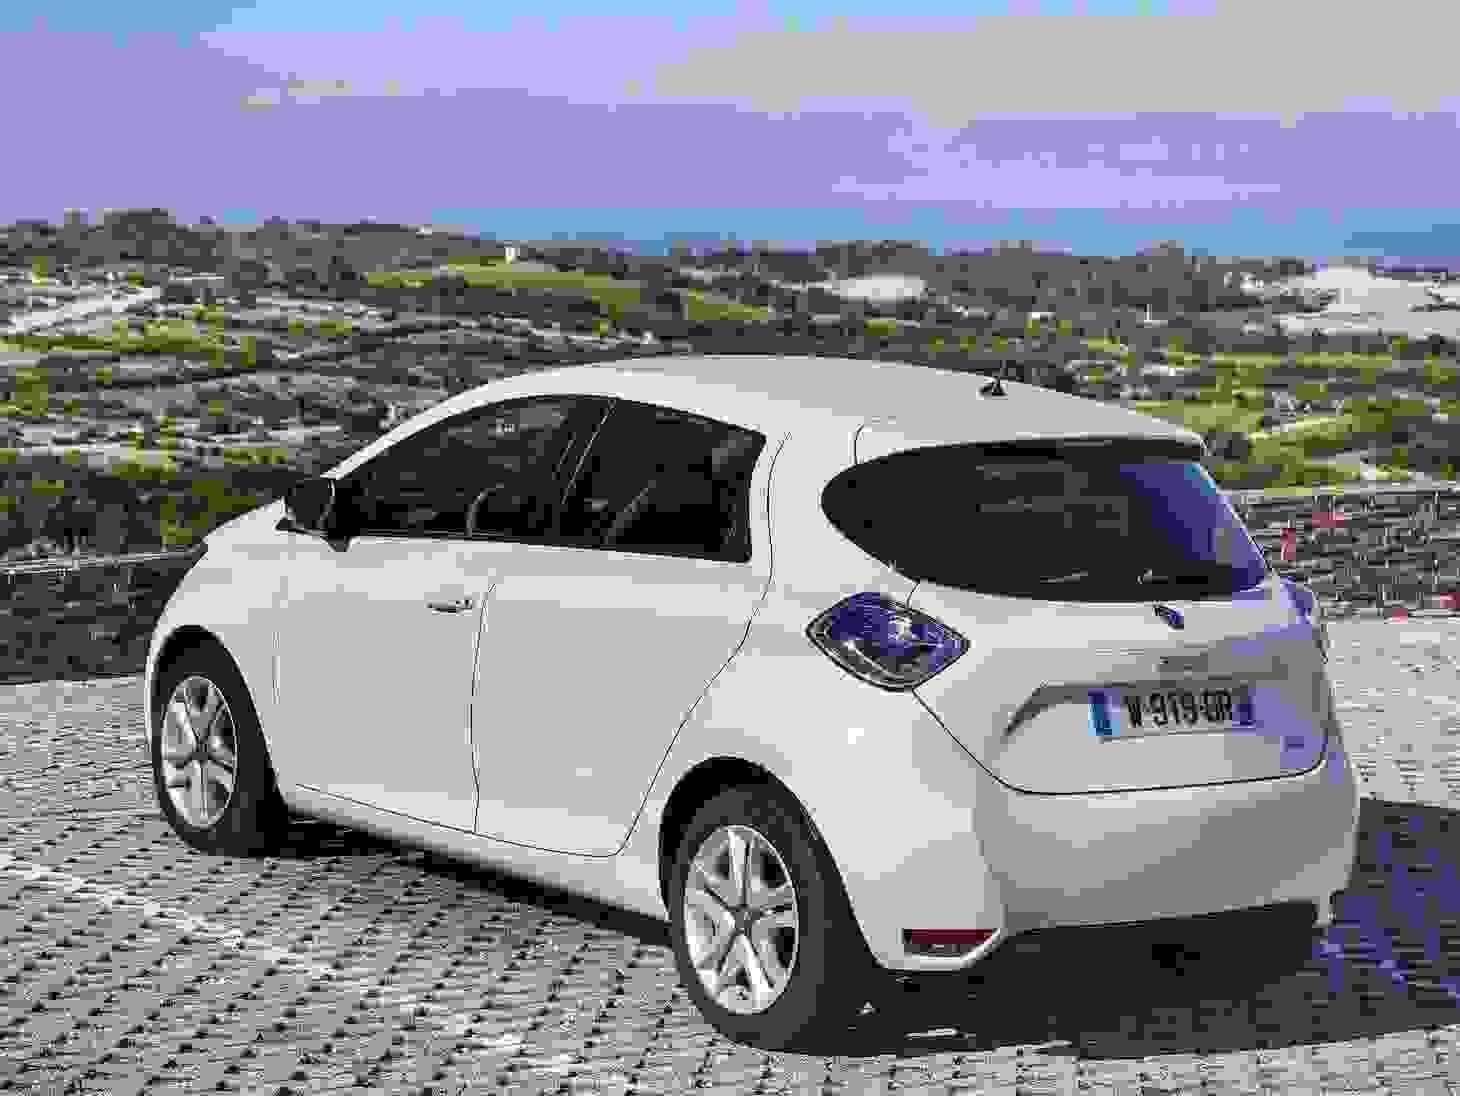 Renault Zoe 2018 Eksterior Elektrisk Bil Elbil Ingen Udladning